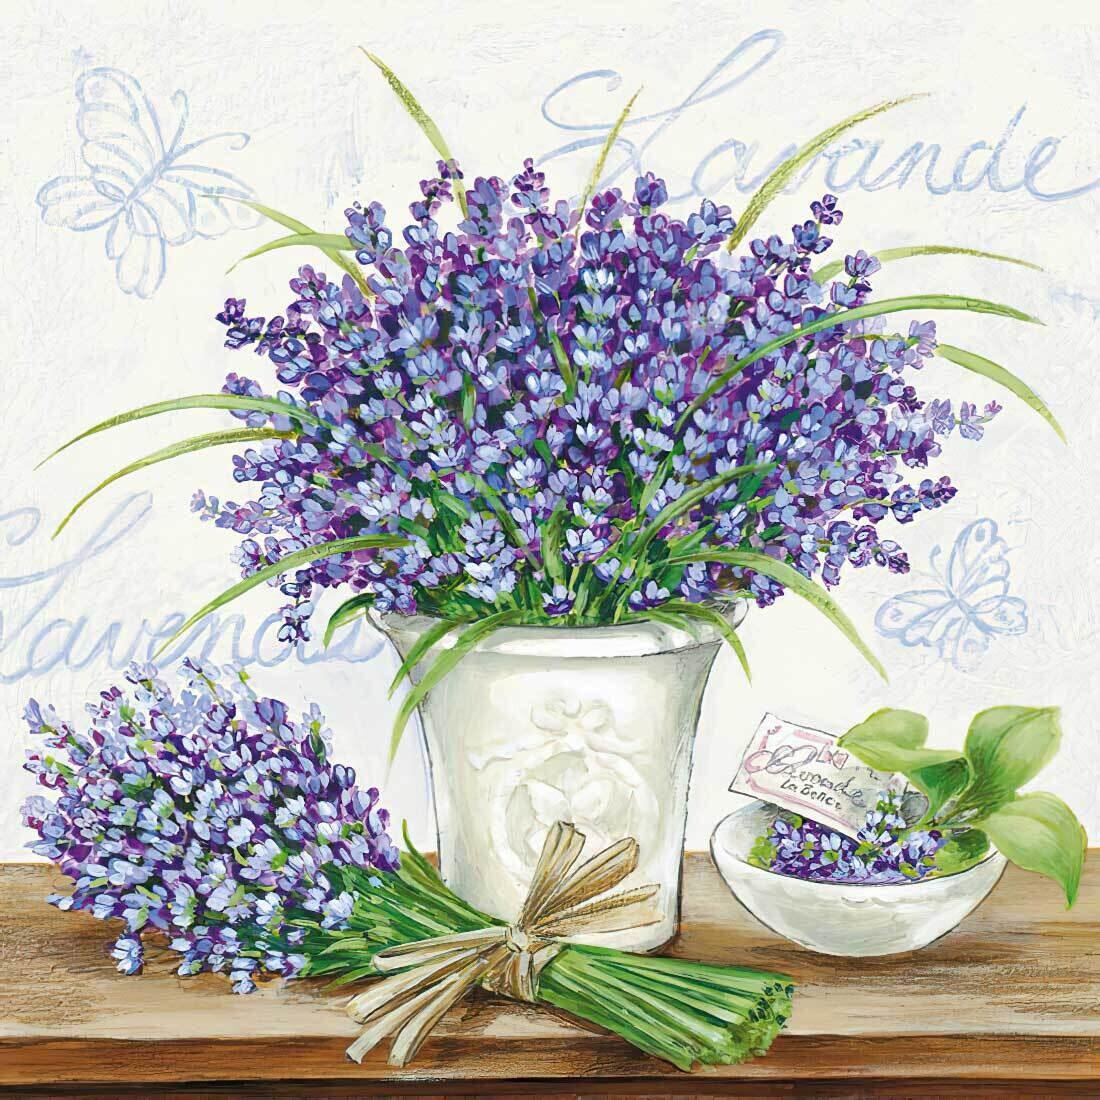 Decoupage Paper Napkins - Floral - Lavender Scene Cream 13x13 (1 Sheet)